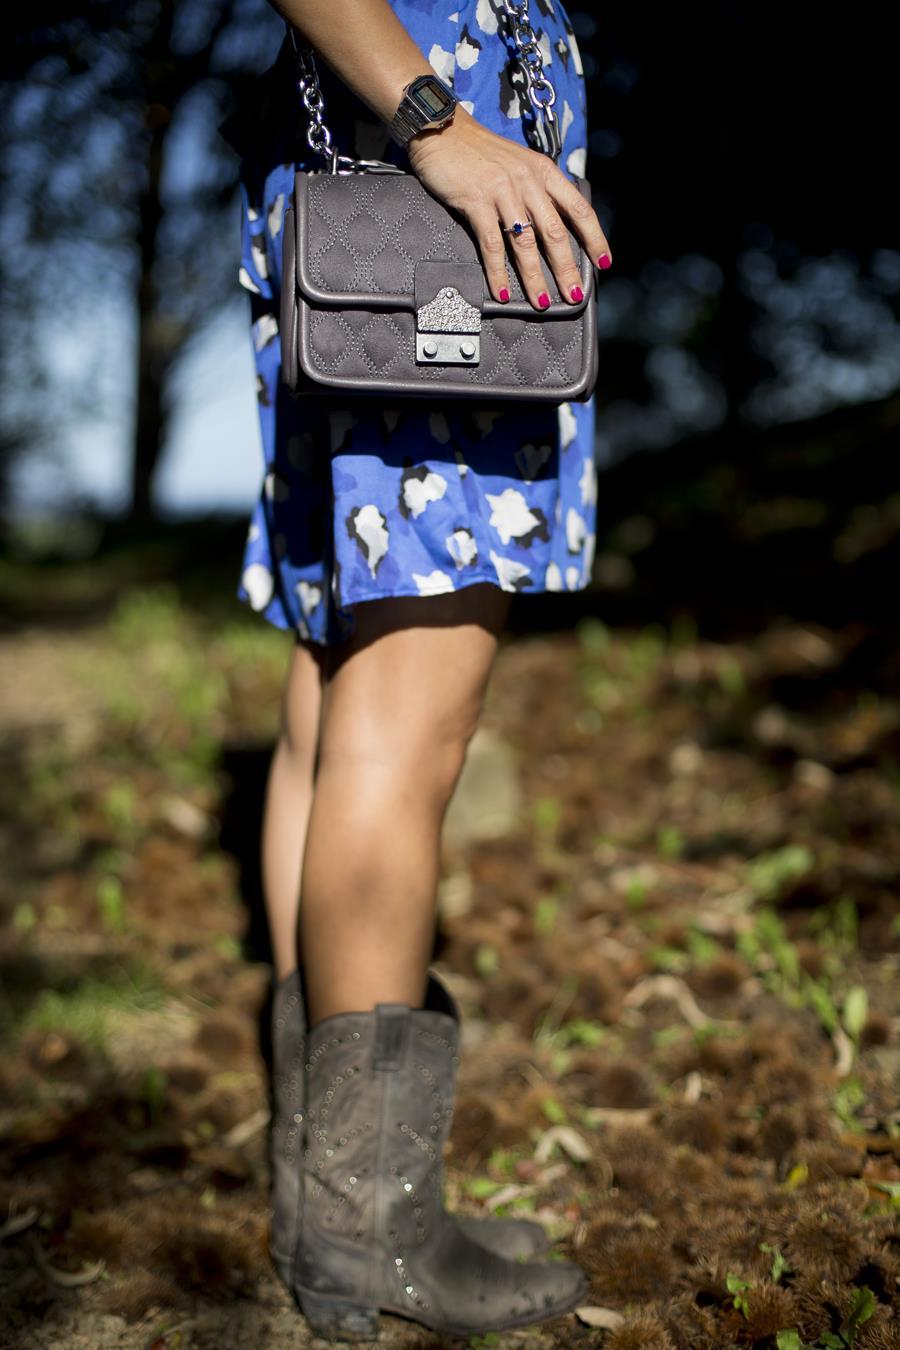 Rebeca Valdivia, personal shopper, estilista, stilist, Donostia, San Sebastián, Miss Clov, Rebeca Valdivia, estilista, personal shopper, stilist, rizos, curls, Vestido de leopardo, botas, Sendra, handmade, hecho a mano, made ni Spain, bag, bolso bandolera, animalprint, leopardo, dress